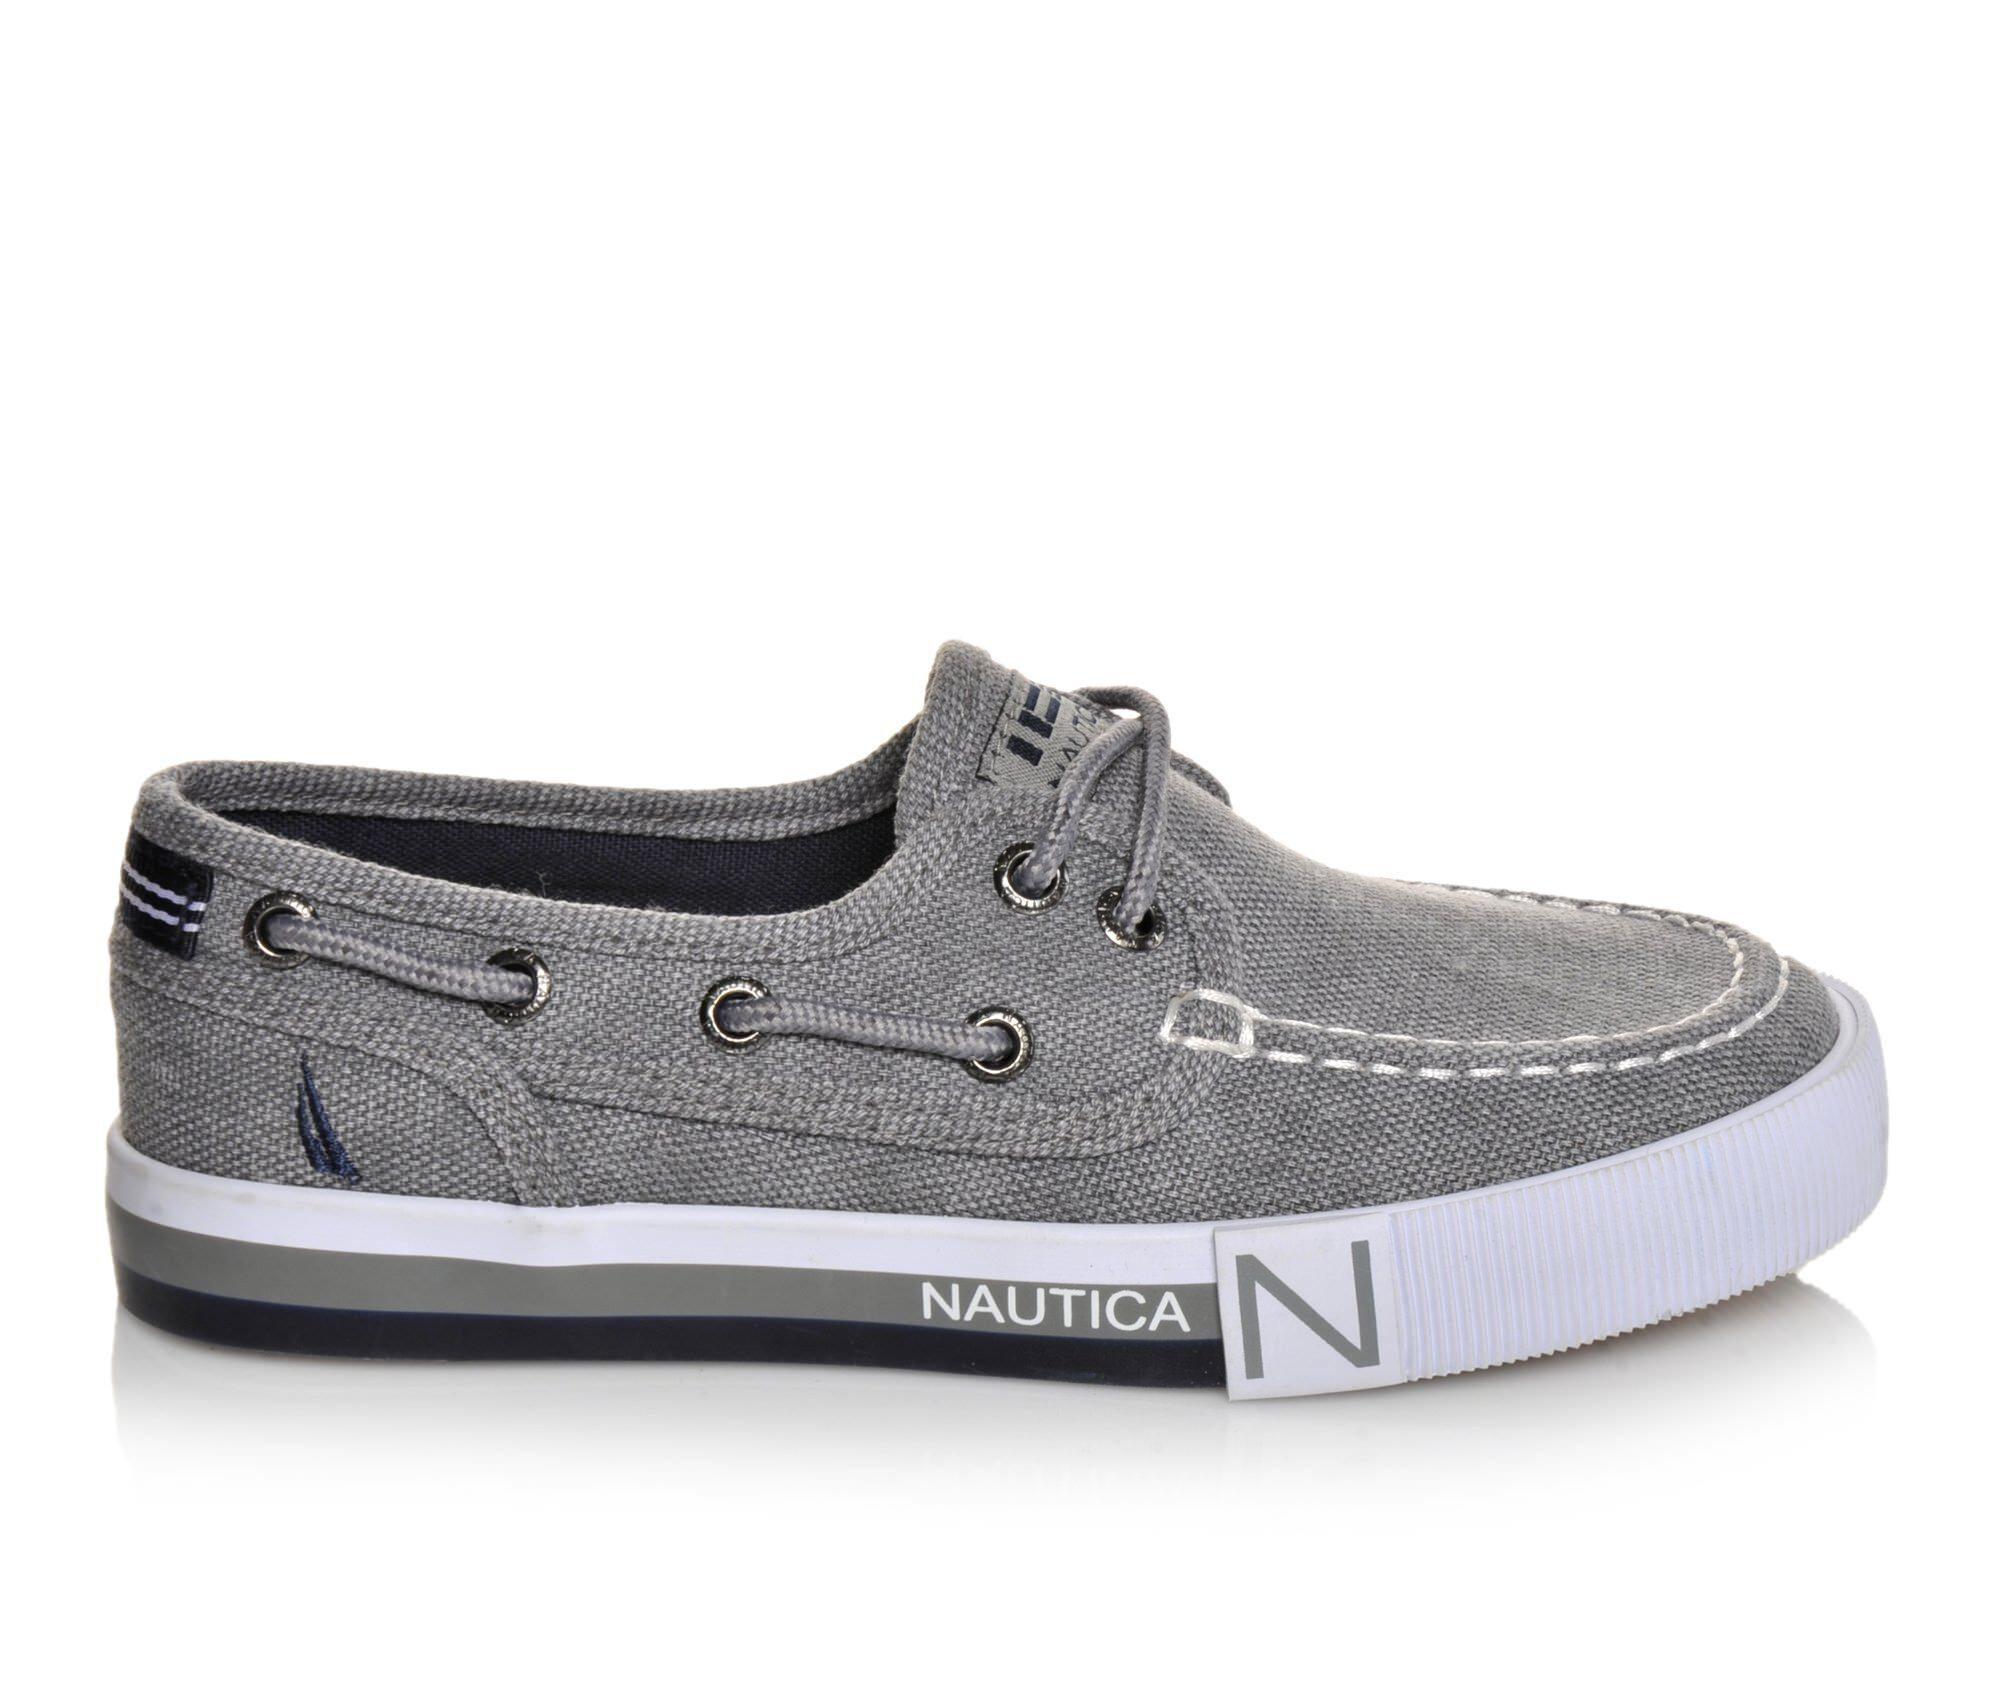 Kid Spinnaker Boat Shoes   Shoe Carnival